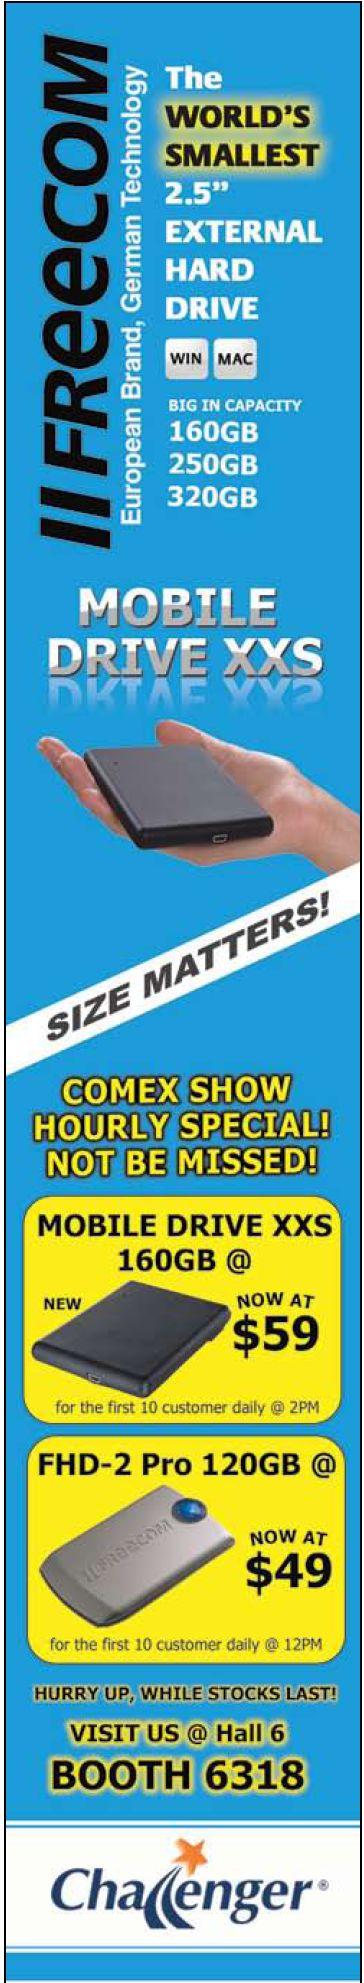 Comex 2008 price list image brochure of Freecom Mobile Drive Xxs Hard Disk